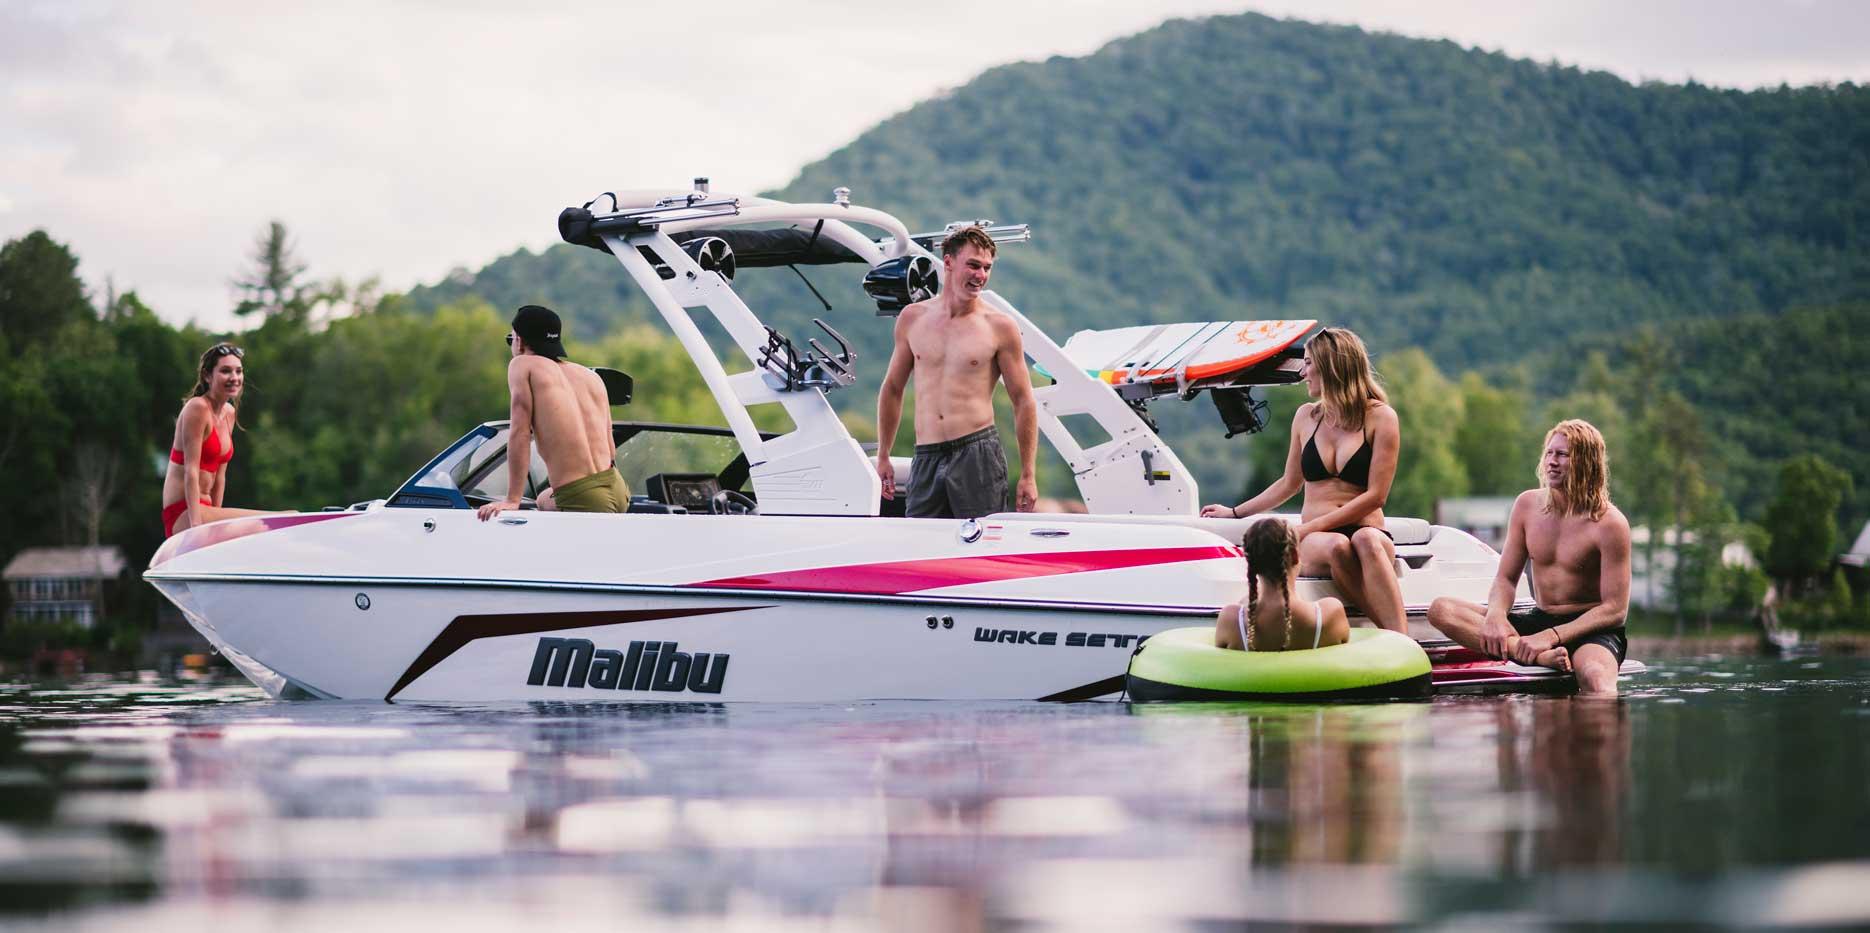 Malibu Boats 21 VLX color scheme